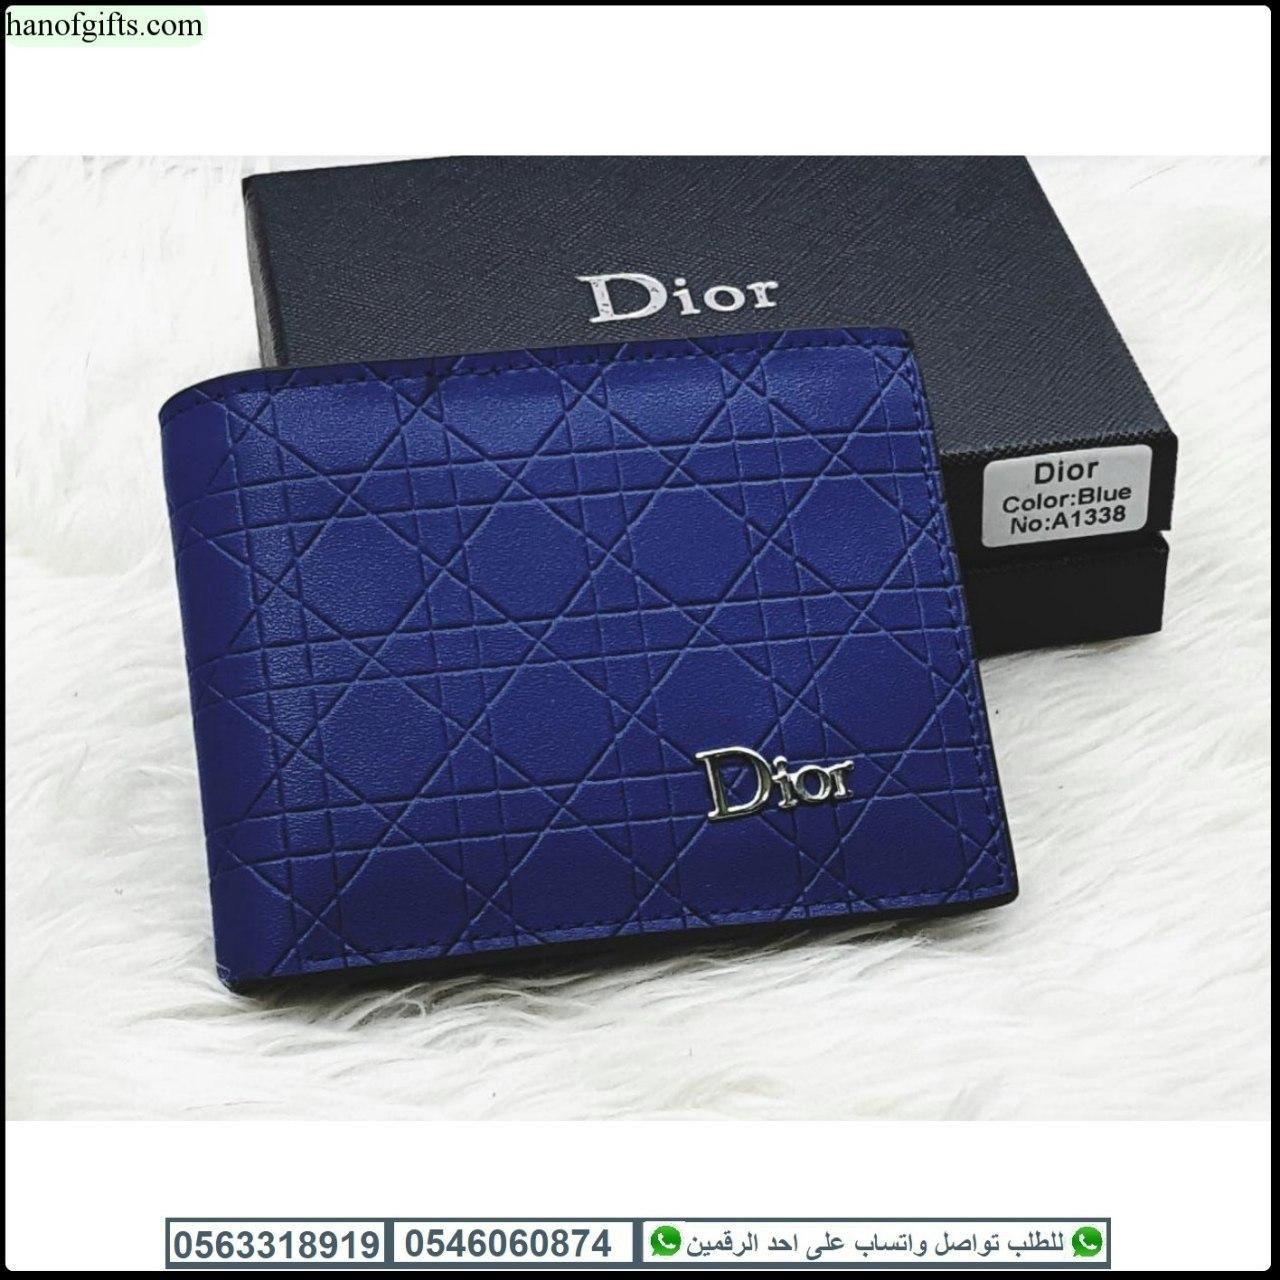 محافظ ديور رجالي فخمه درجه اولى مع علبه و كرت الماركه هدايا هنوف French Wallet Wallet Blue Color